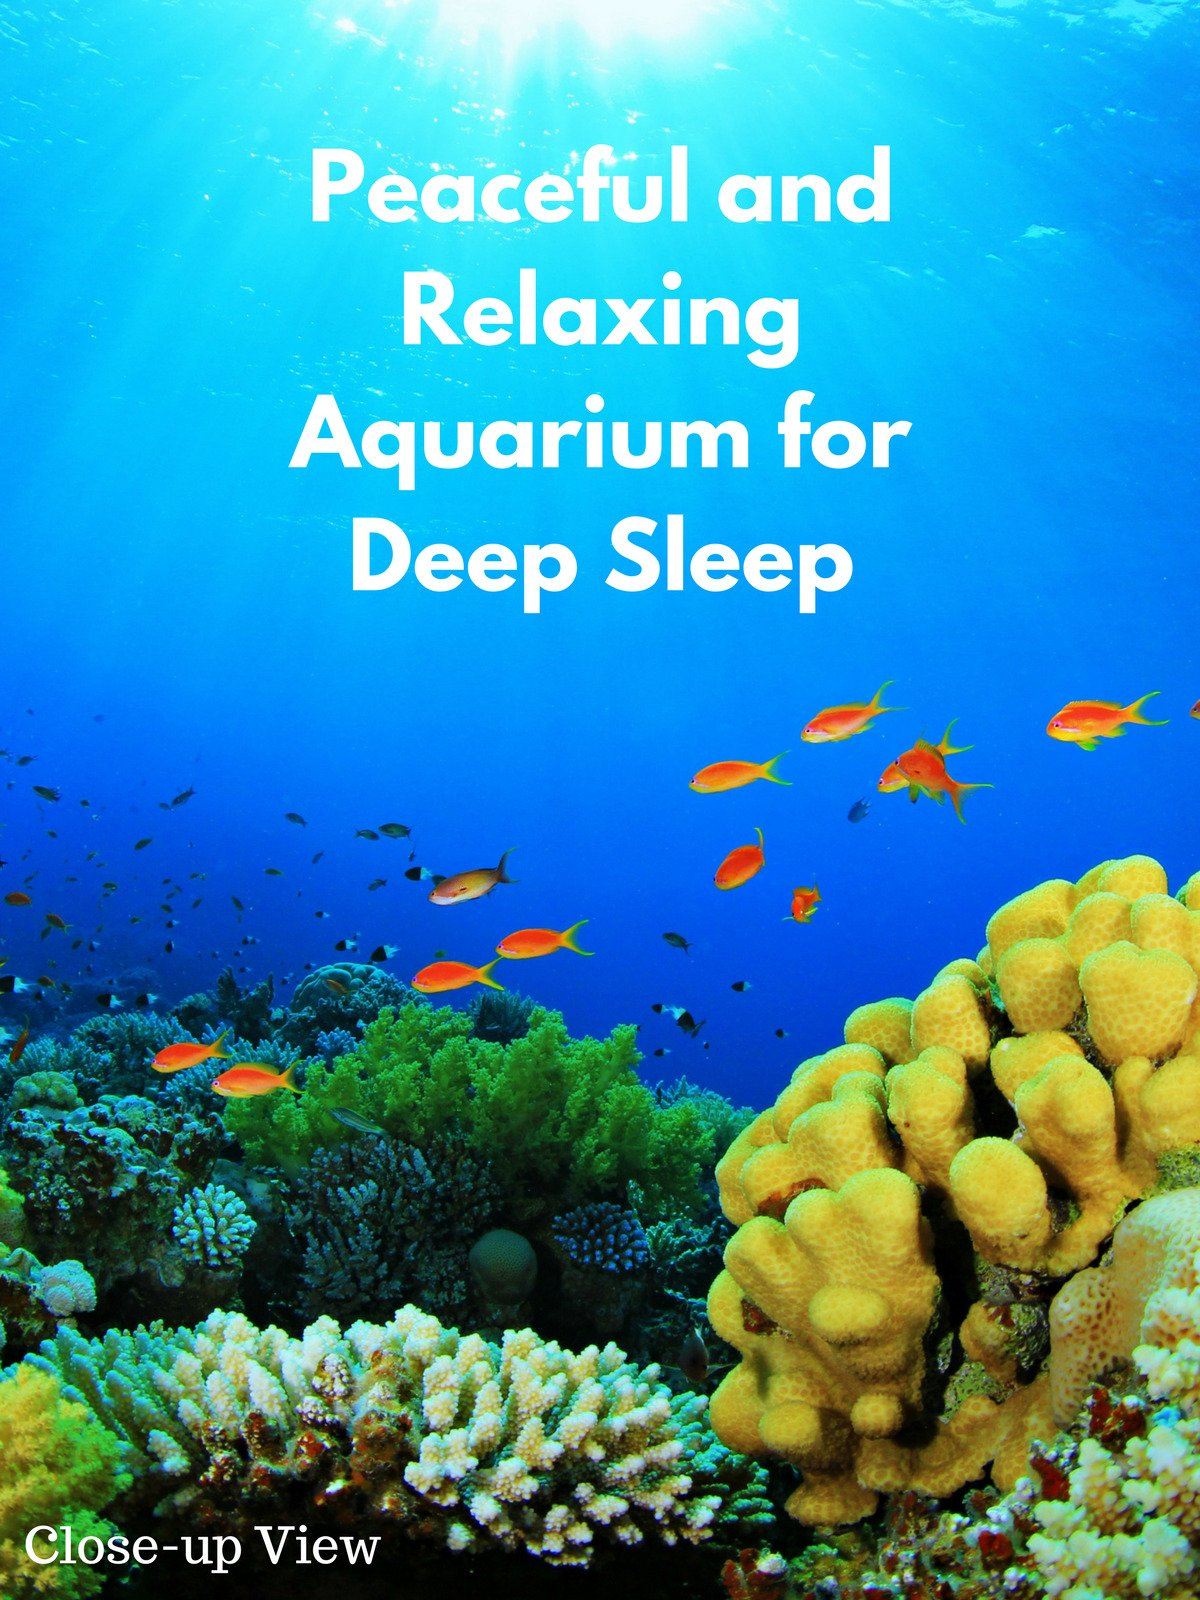 Peaceful and Relaxing Aquarium for Deep Sleep